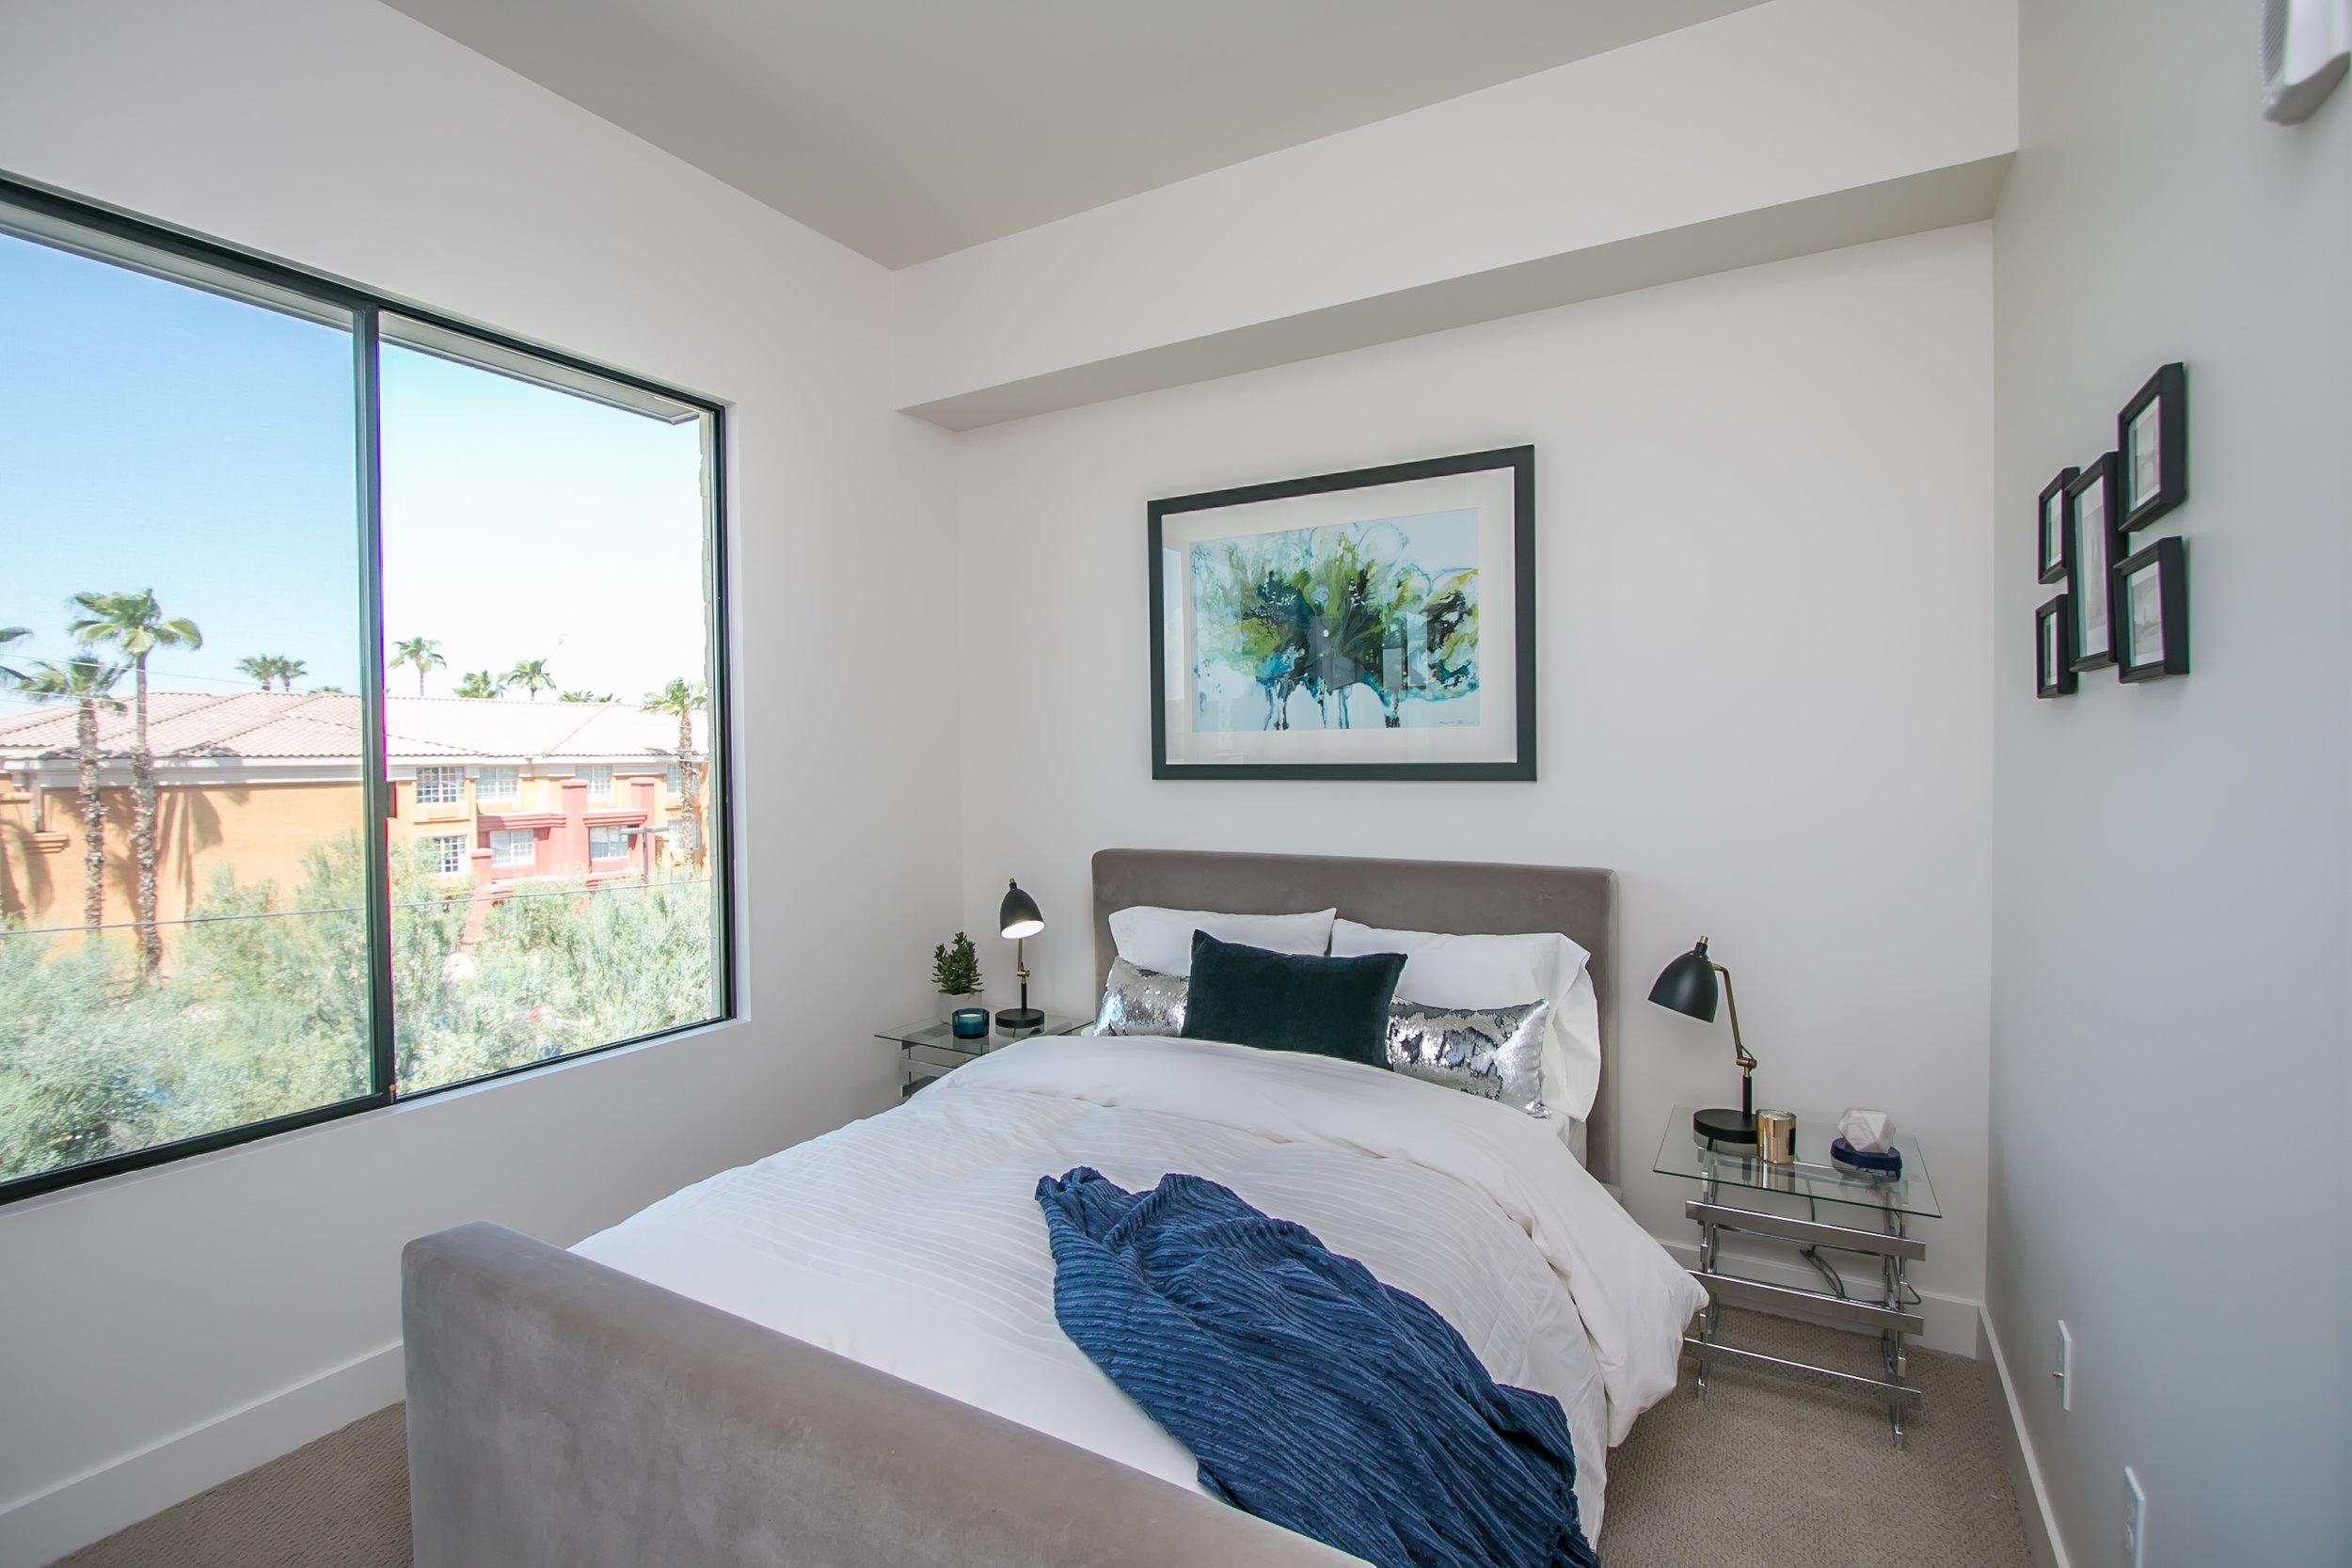 inspire-master-bedroom-relax